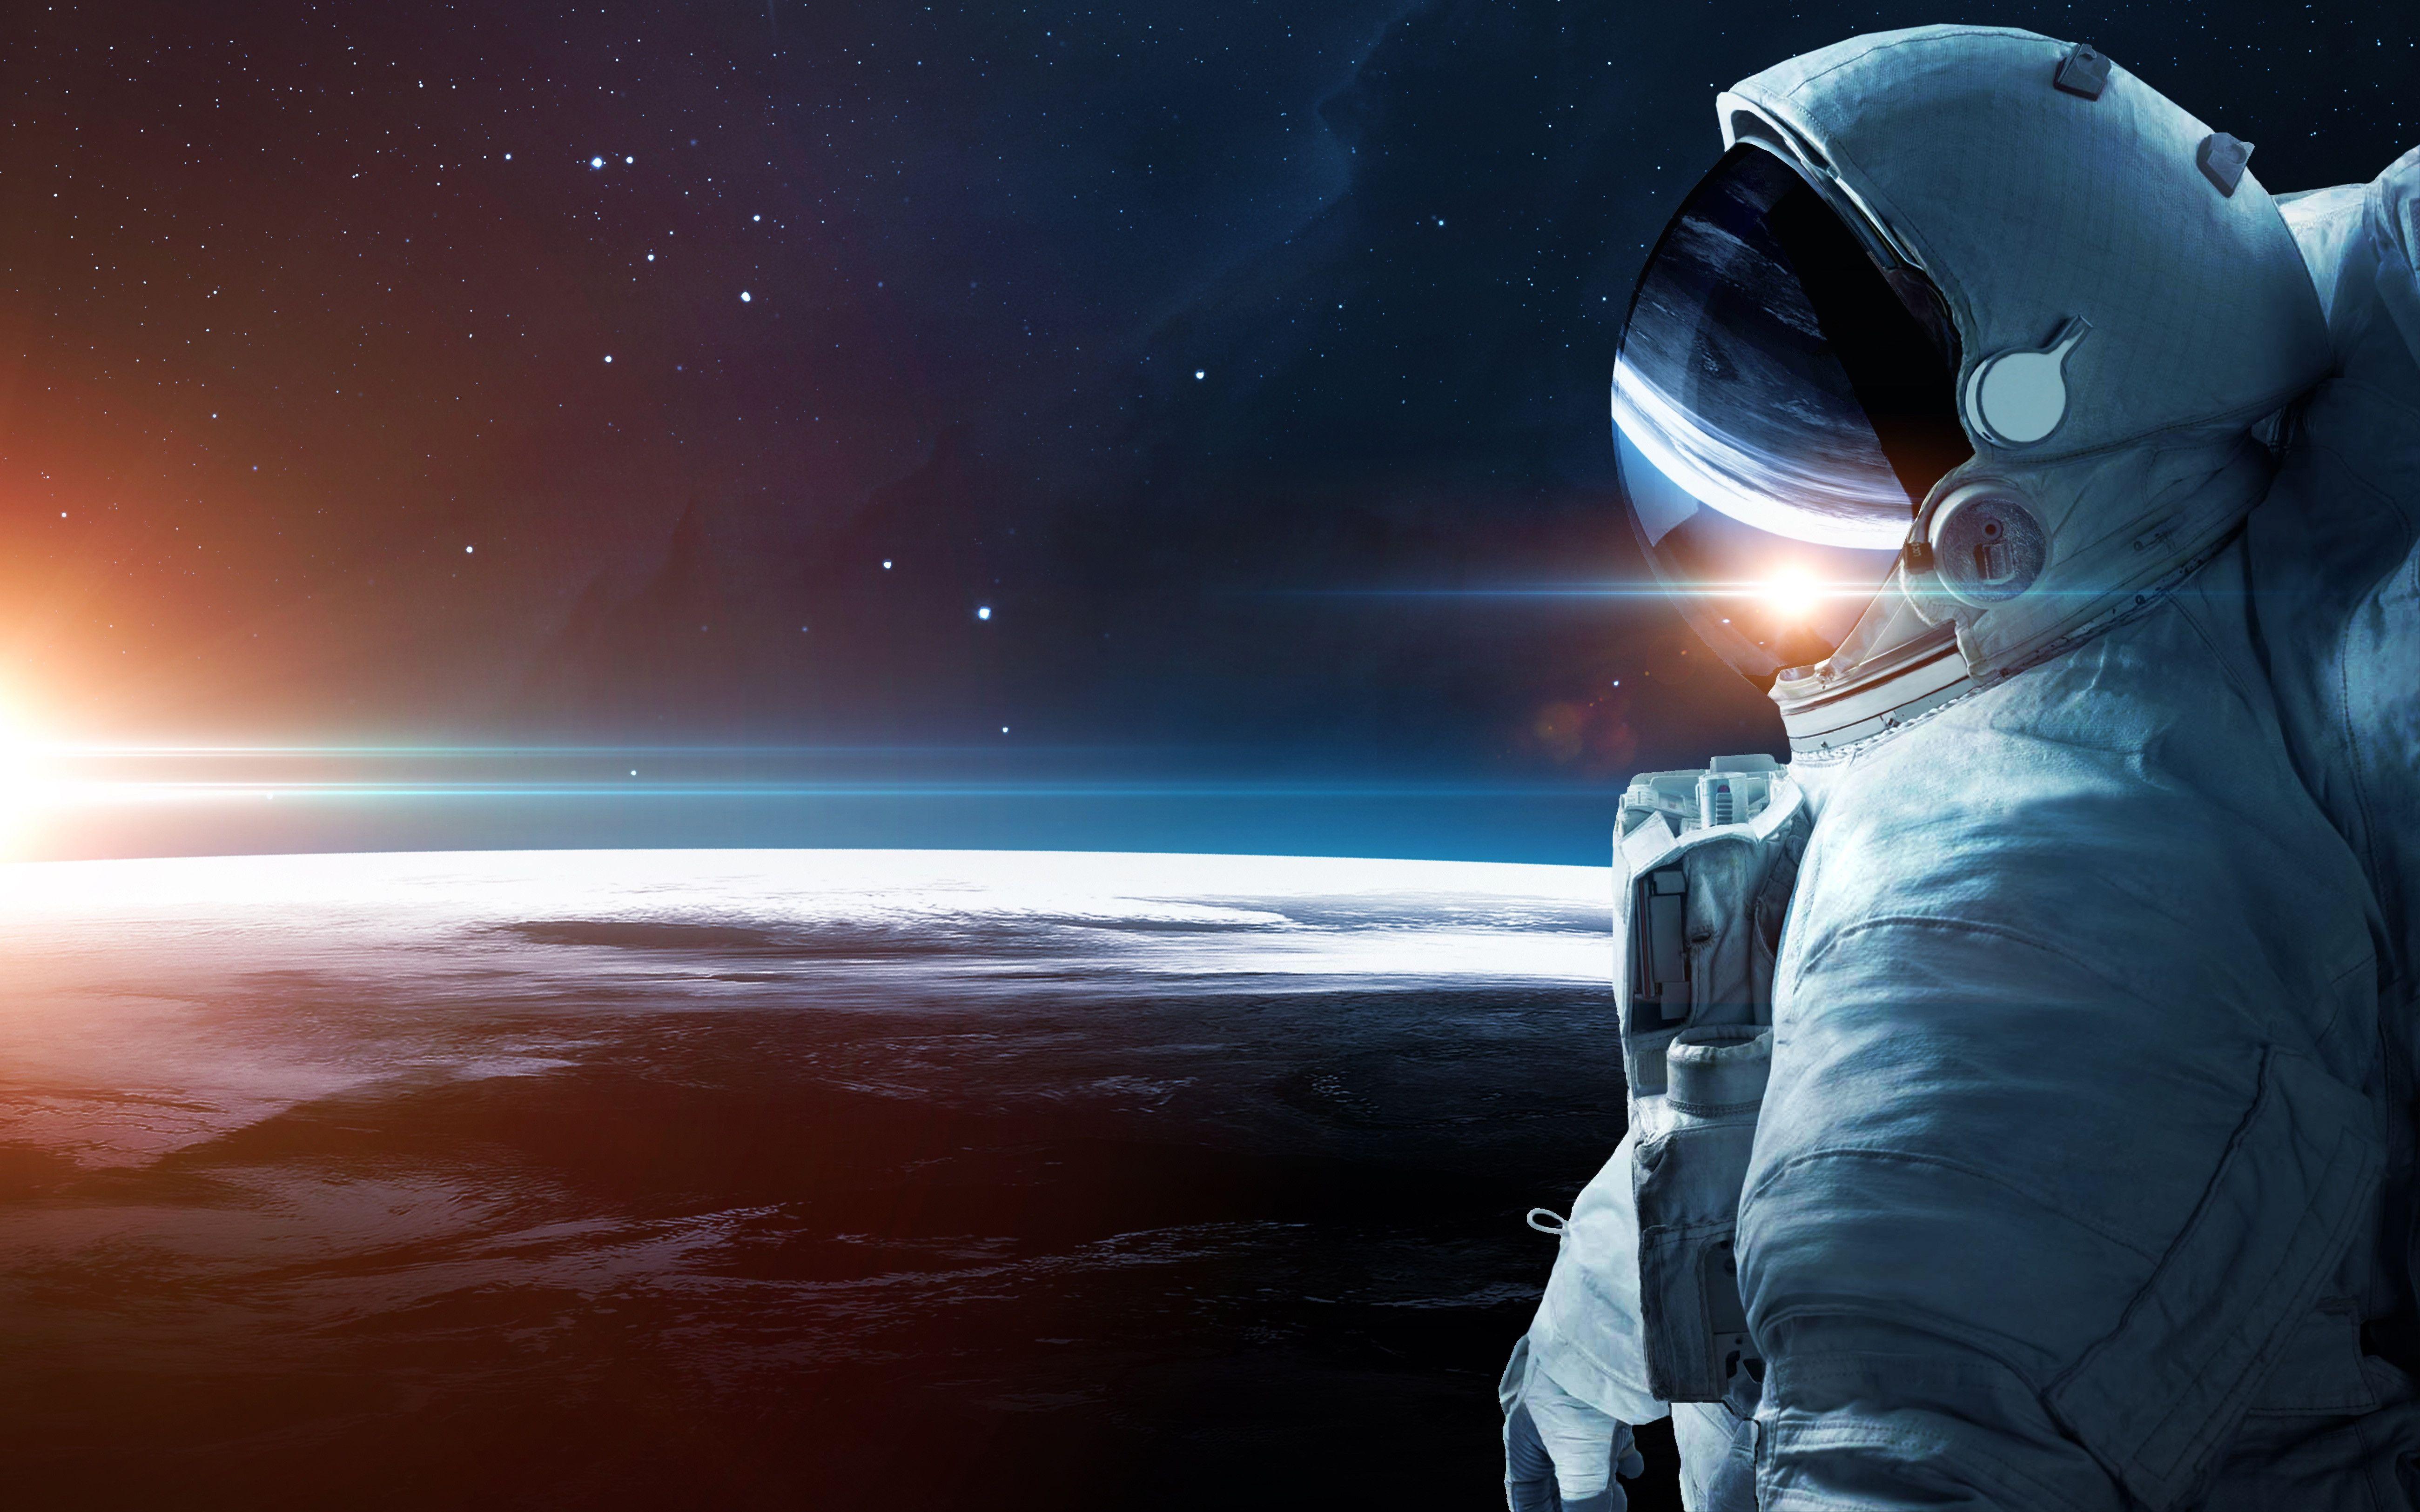 Fondo De Pantalla Hd Con Imagenes 4k Para 219 Astronauta Fondos E Escritorio 829193 5200x3250px Viaje Astral Fondos De Pantalla Hd Imagenes De Fondo